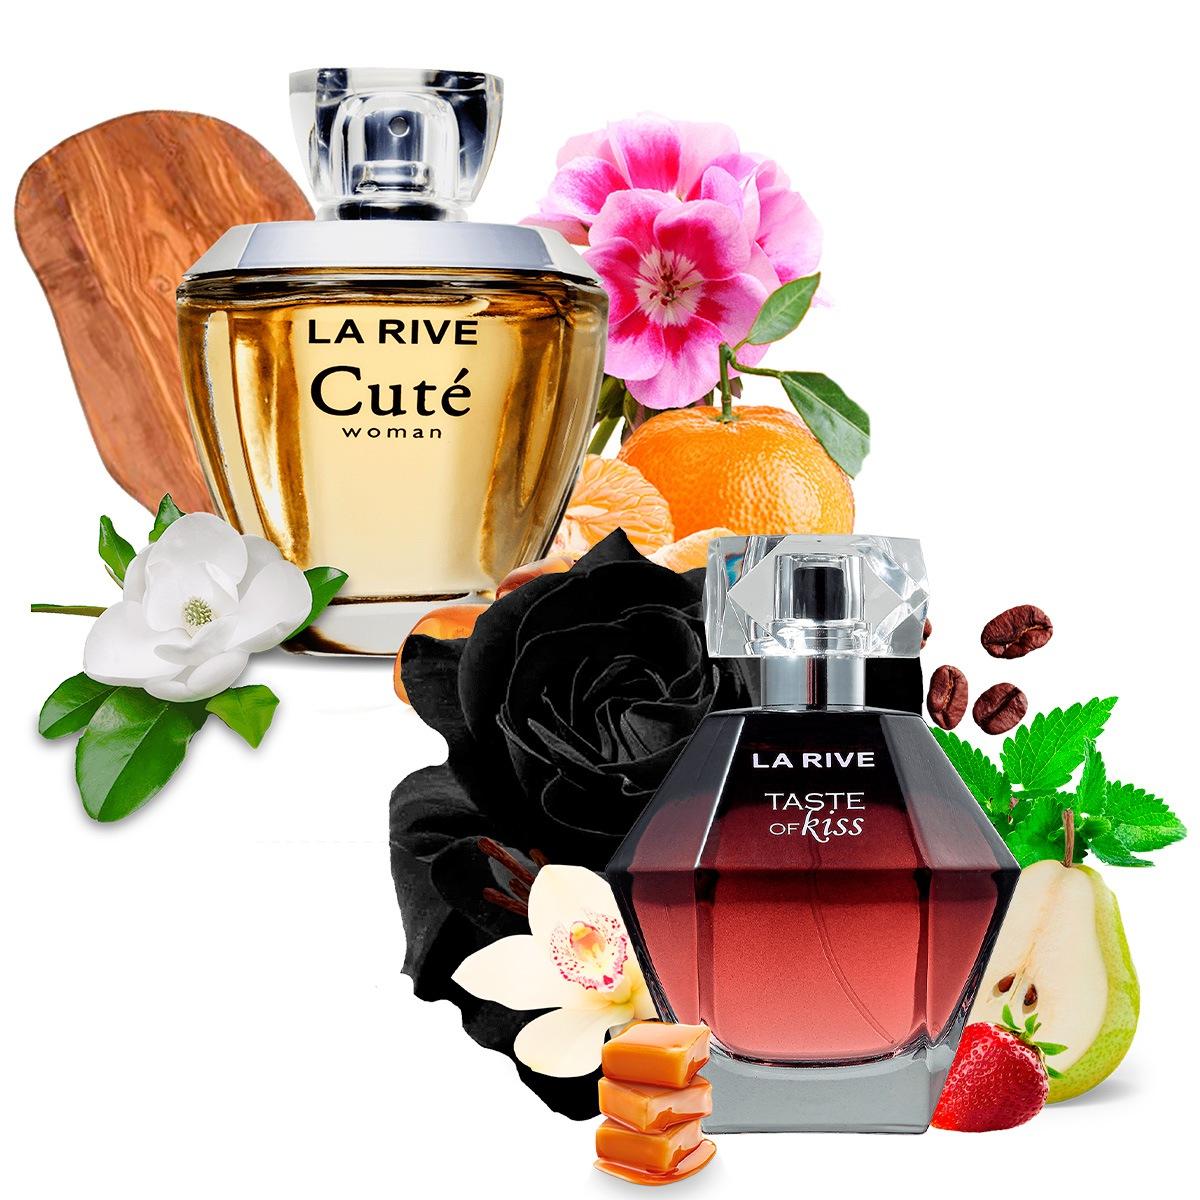 Kit 2 Perfumes Importados Cuté e Taste of Kiss La Rive